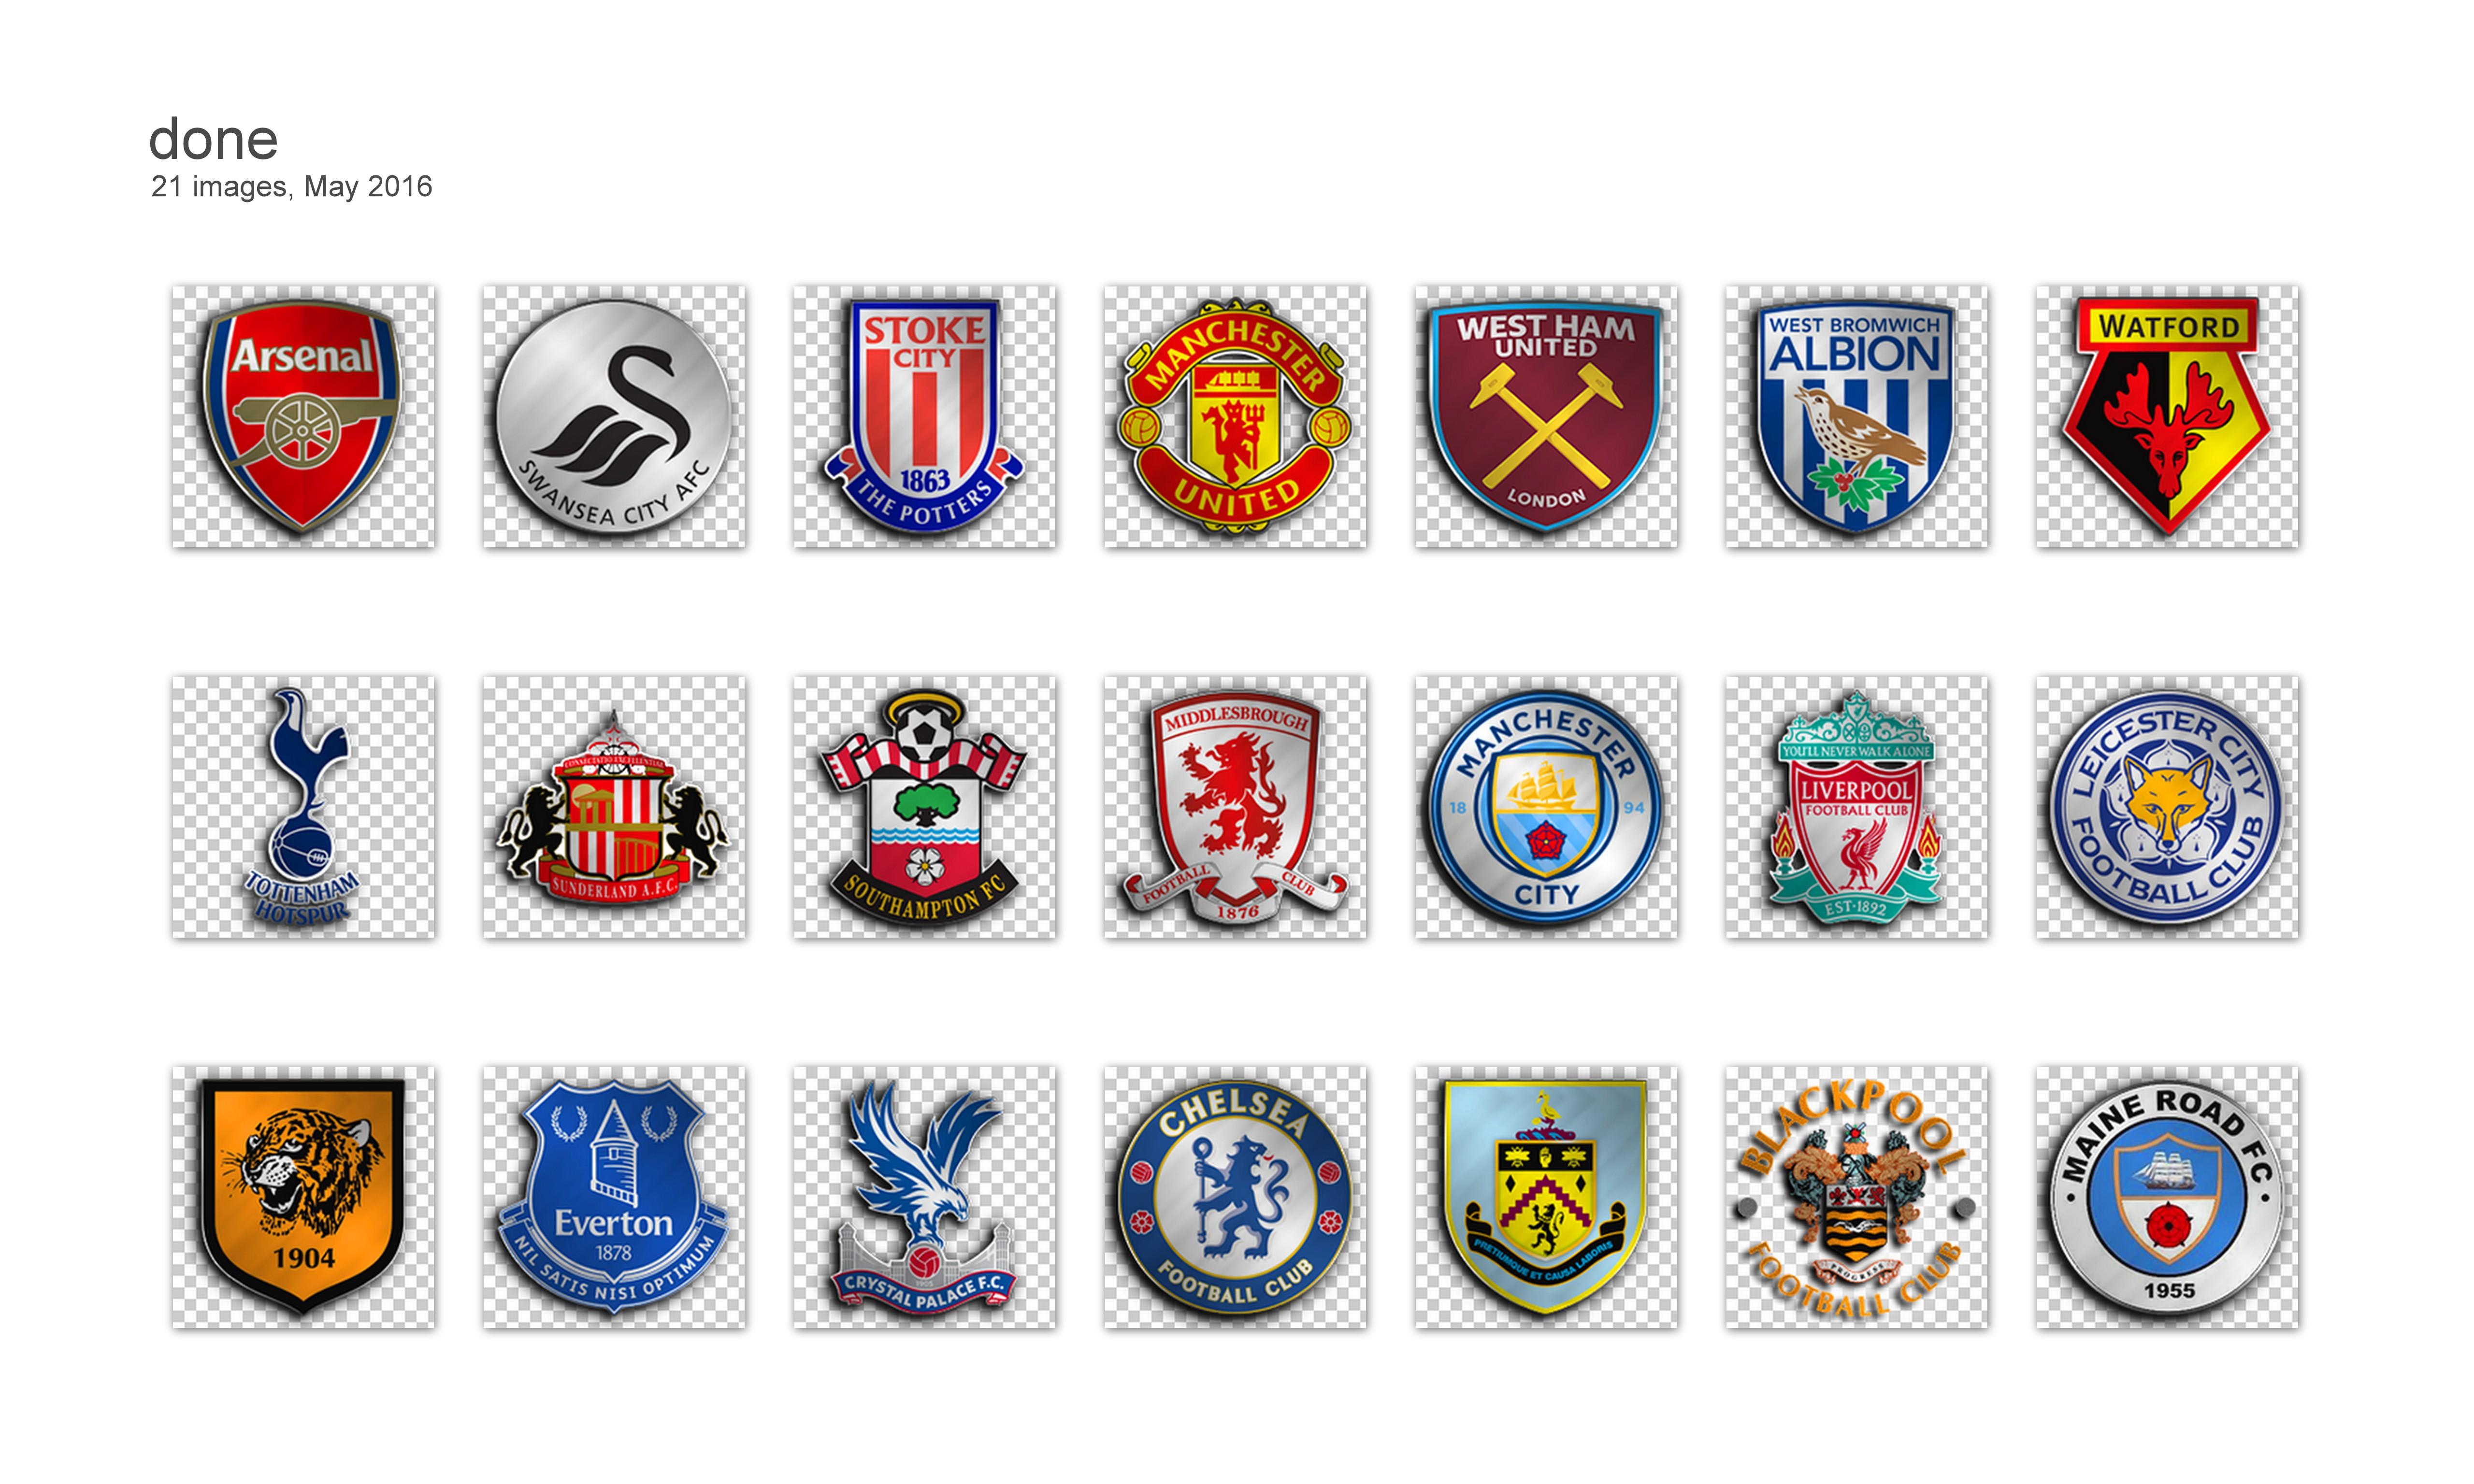 download dls 18 logos v1 zip